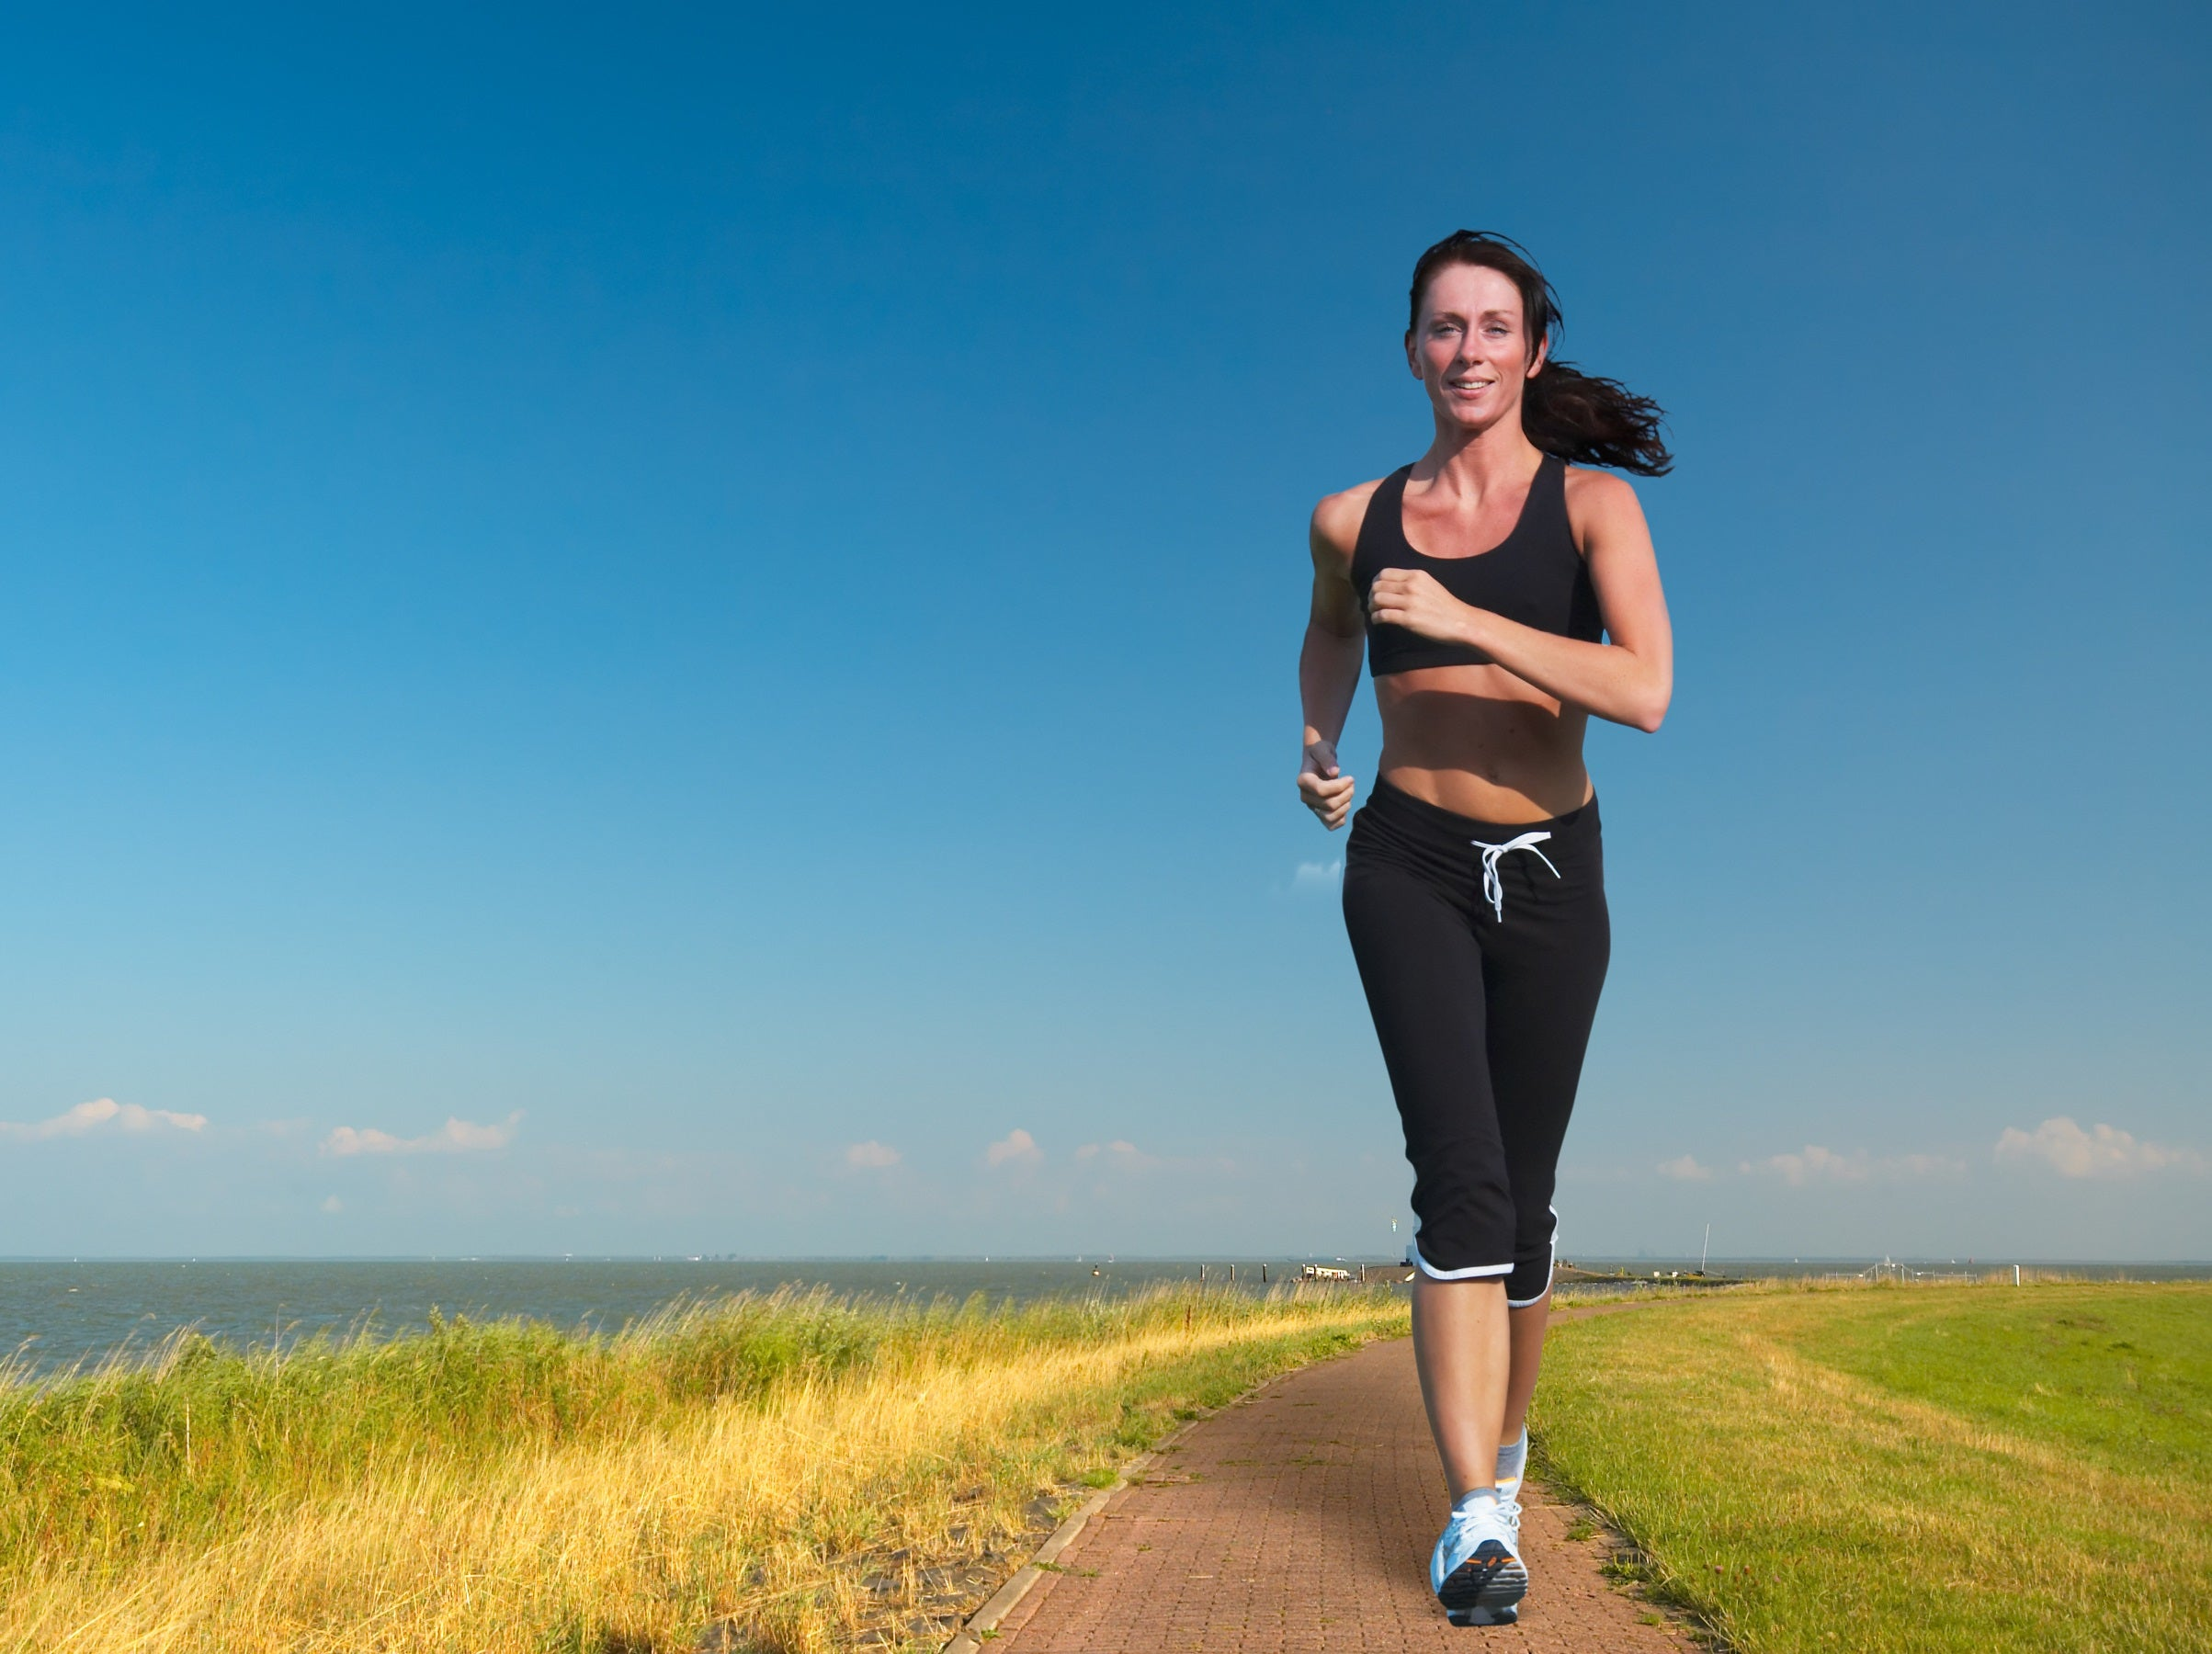 Ejercicios para adelgazar andando